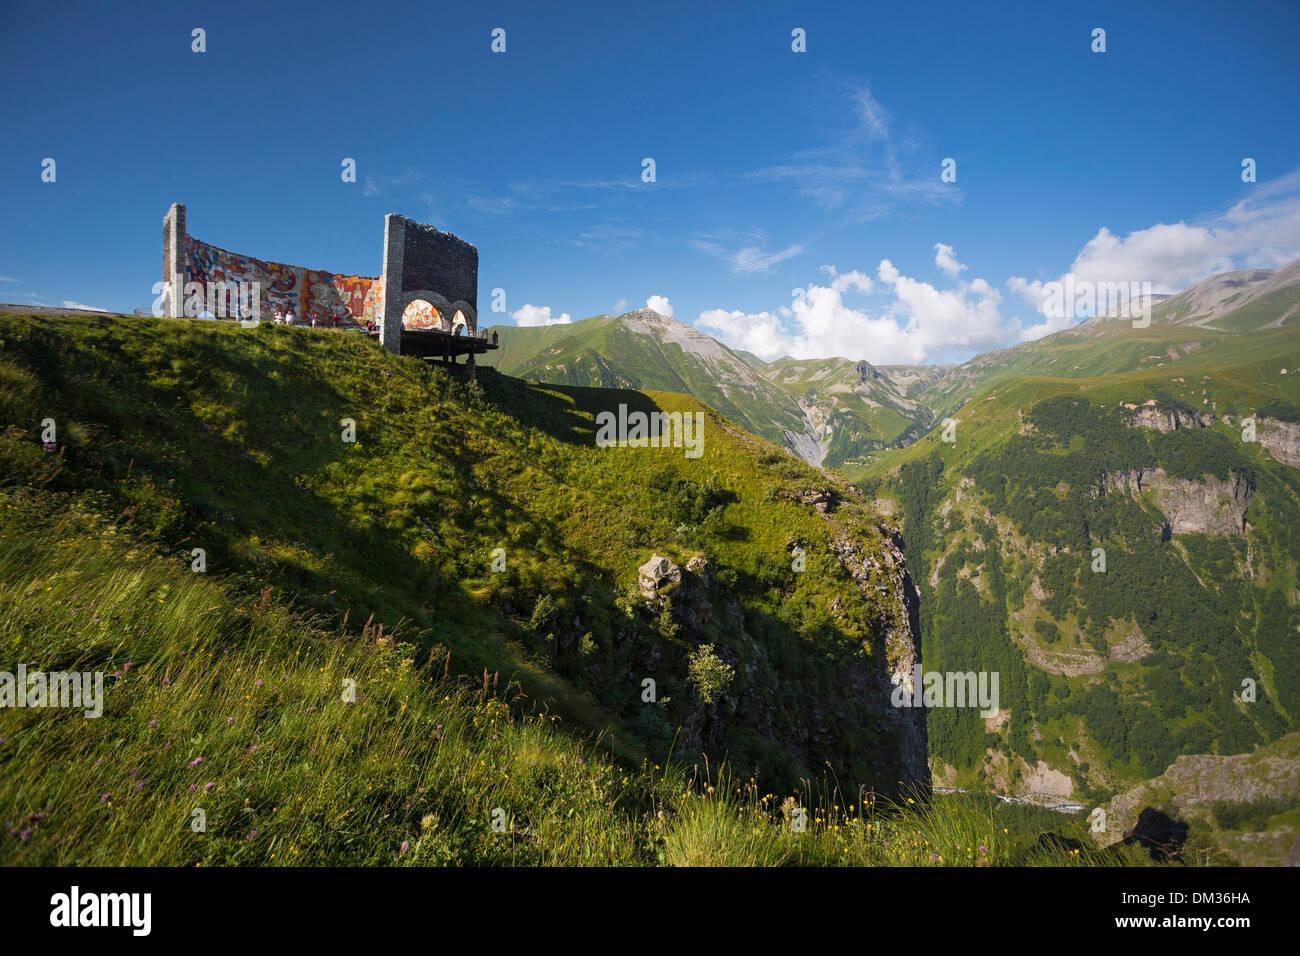 Gudauri Russian Caucasus colourful friendship Georgia Caucasus Eurasia lookout monument mountains pass range top touristic - Stock Image